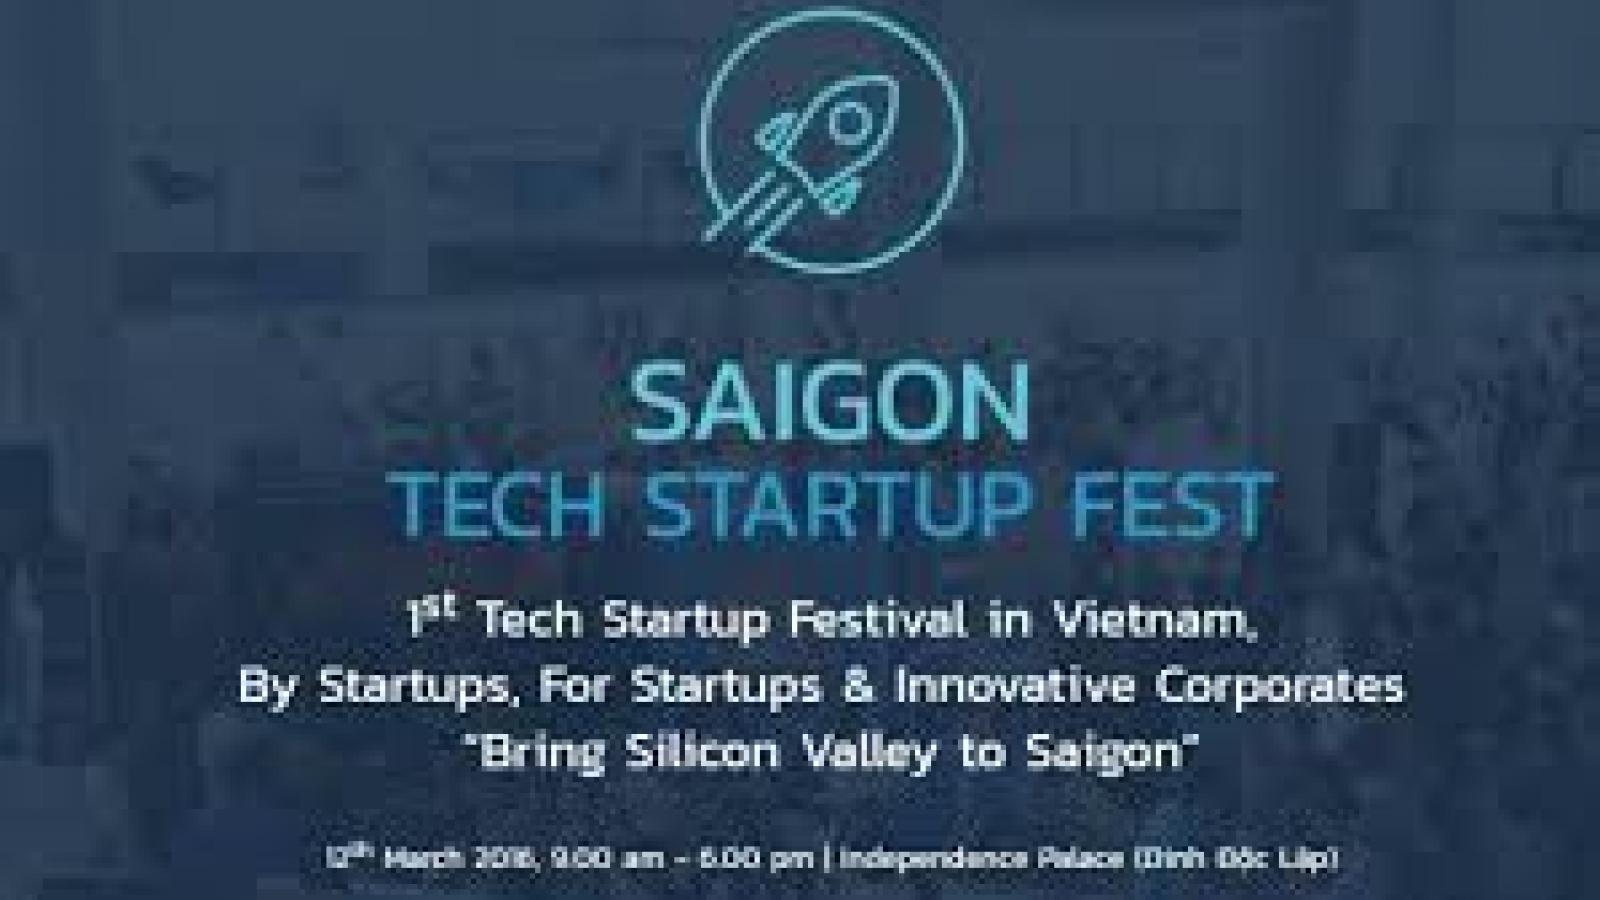 Saigon Startup Fest registration opens